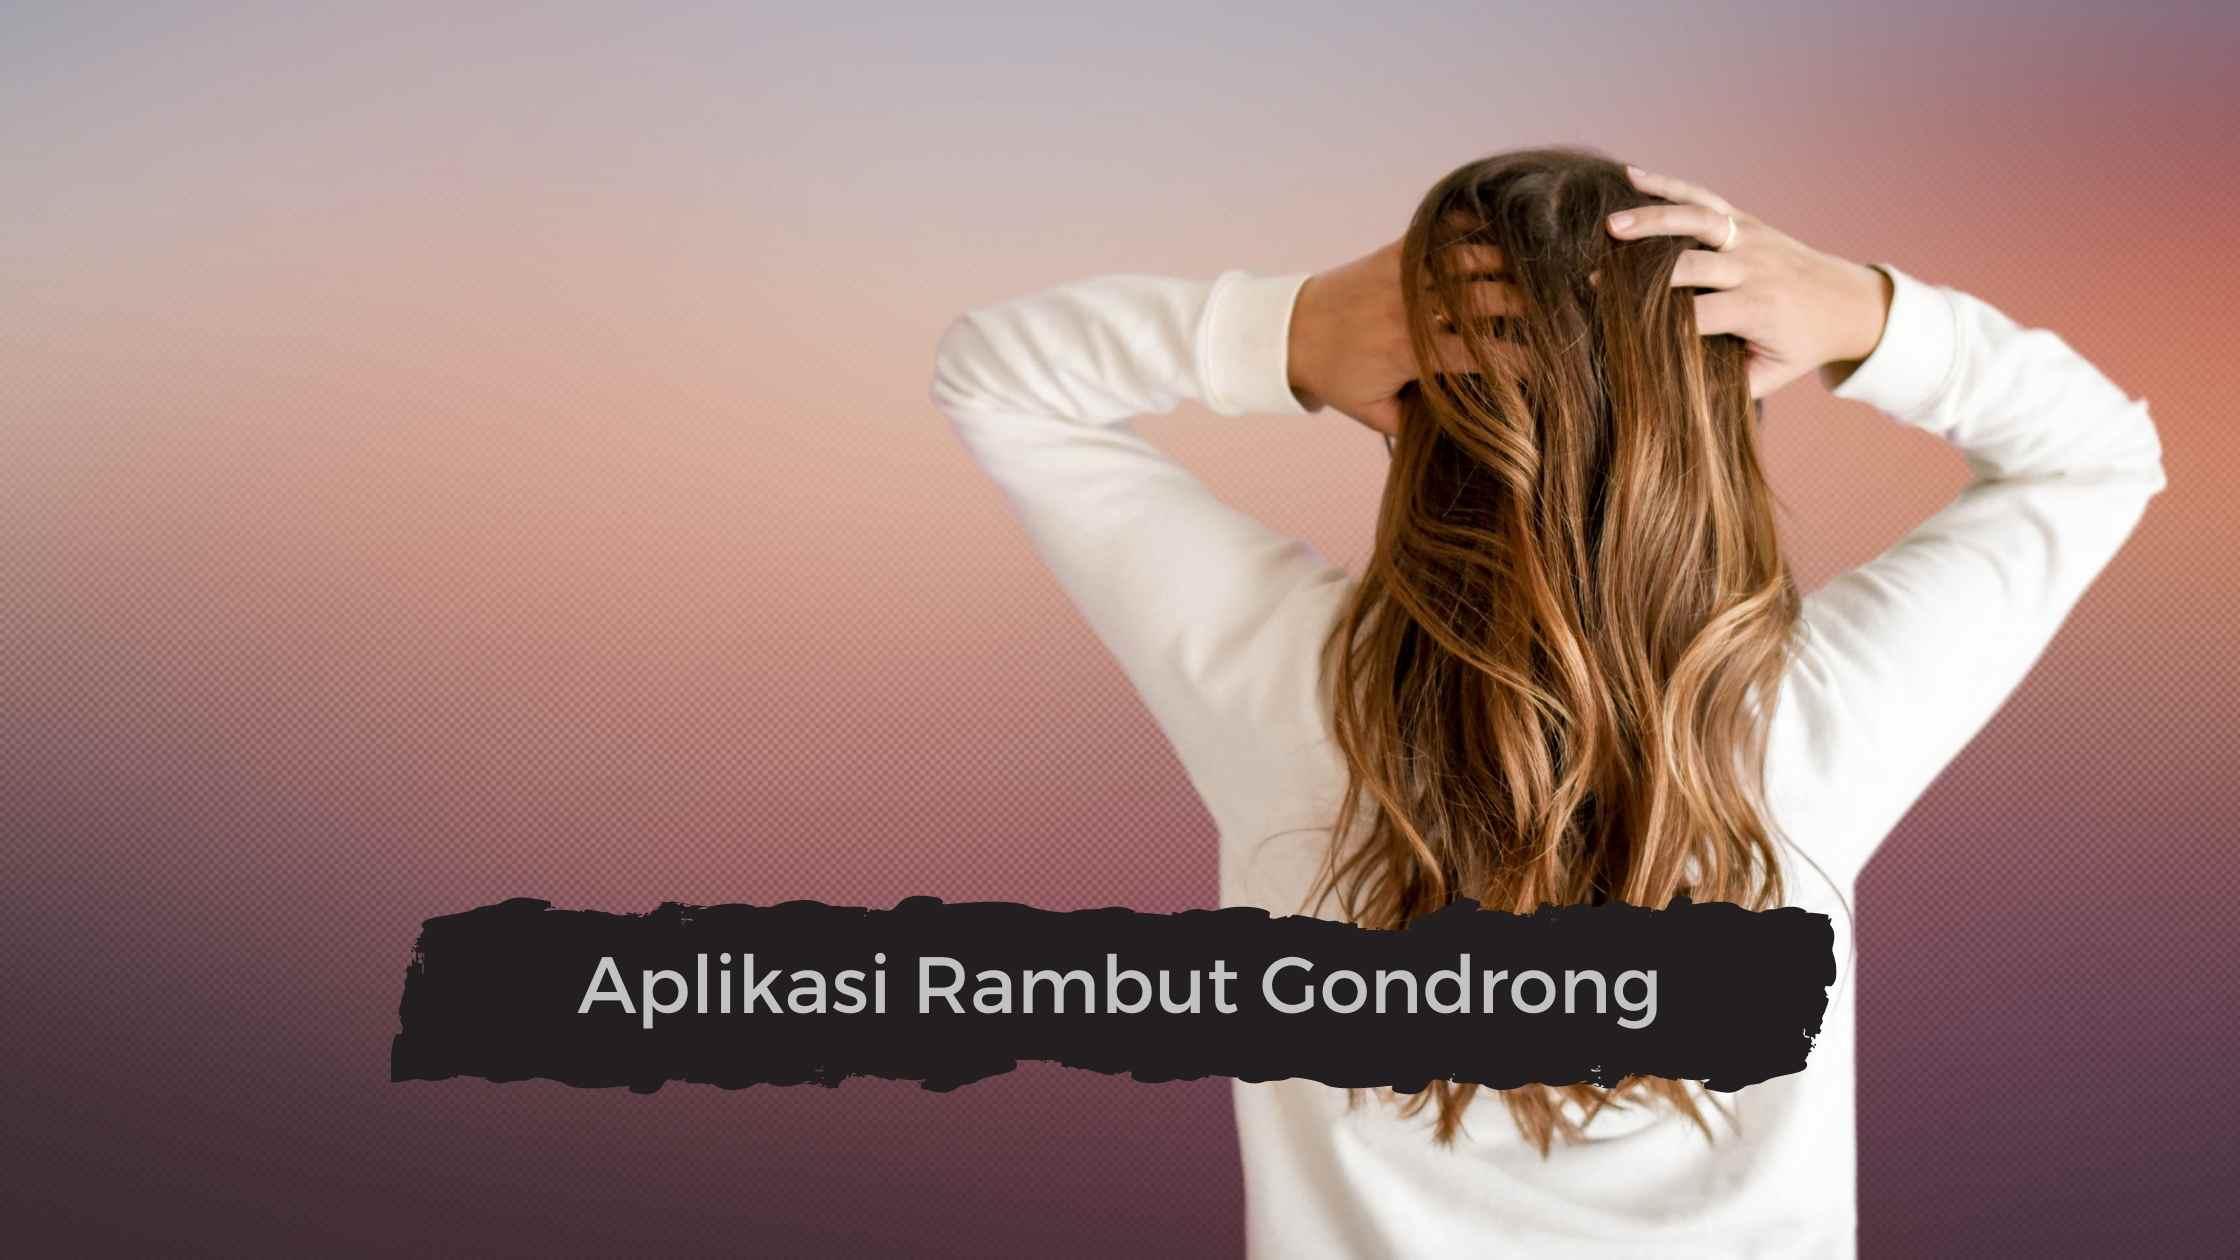 Aplikasi Rambut Gondrong